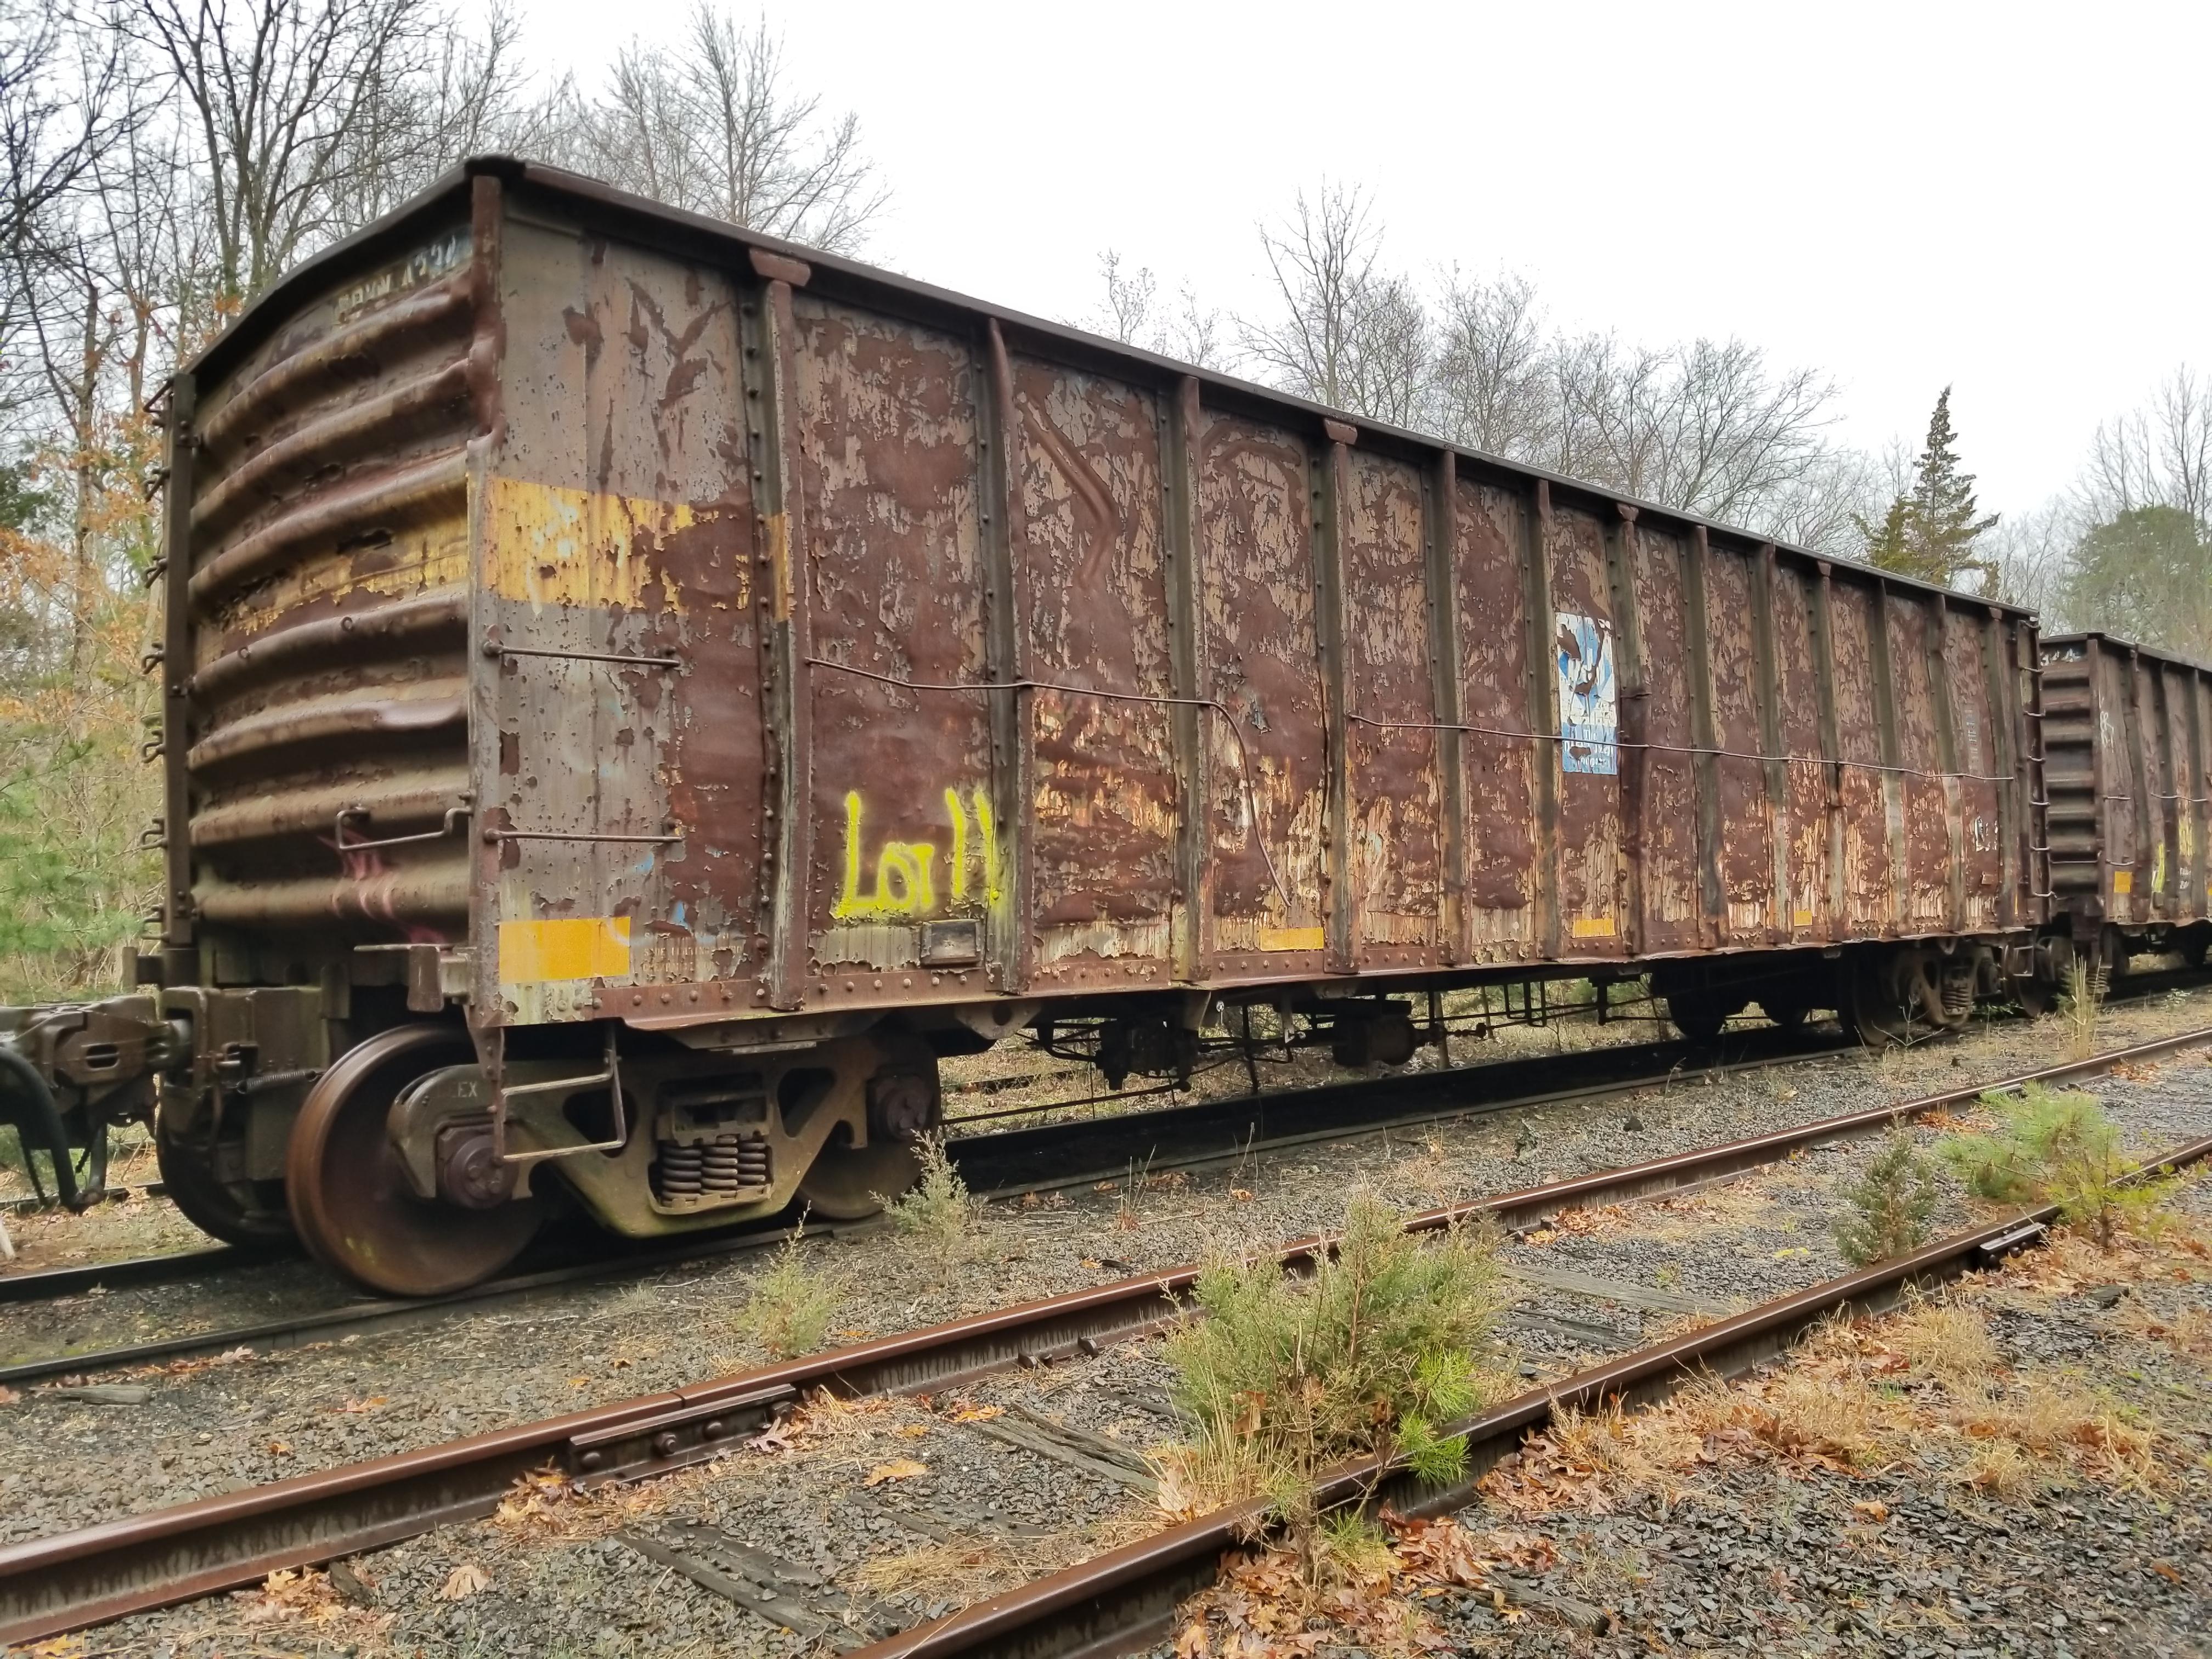 Lot 11 - LOT 11 - (X 6) HIGH-SIDED GONDOLA RAIL CARS (DENNISVILLE, NJ) (11-1) 1984 SRXX 4130 HIGH-SIDED